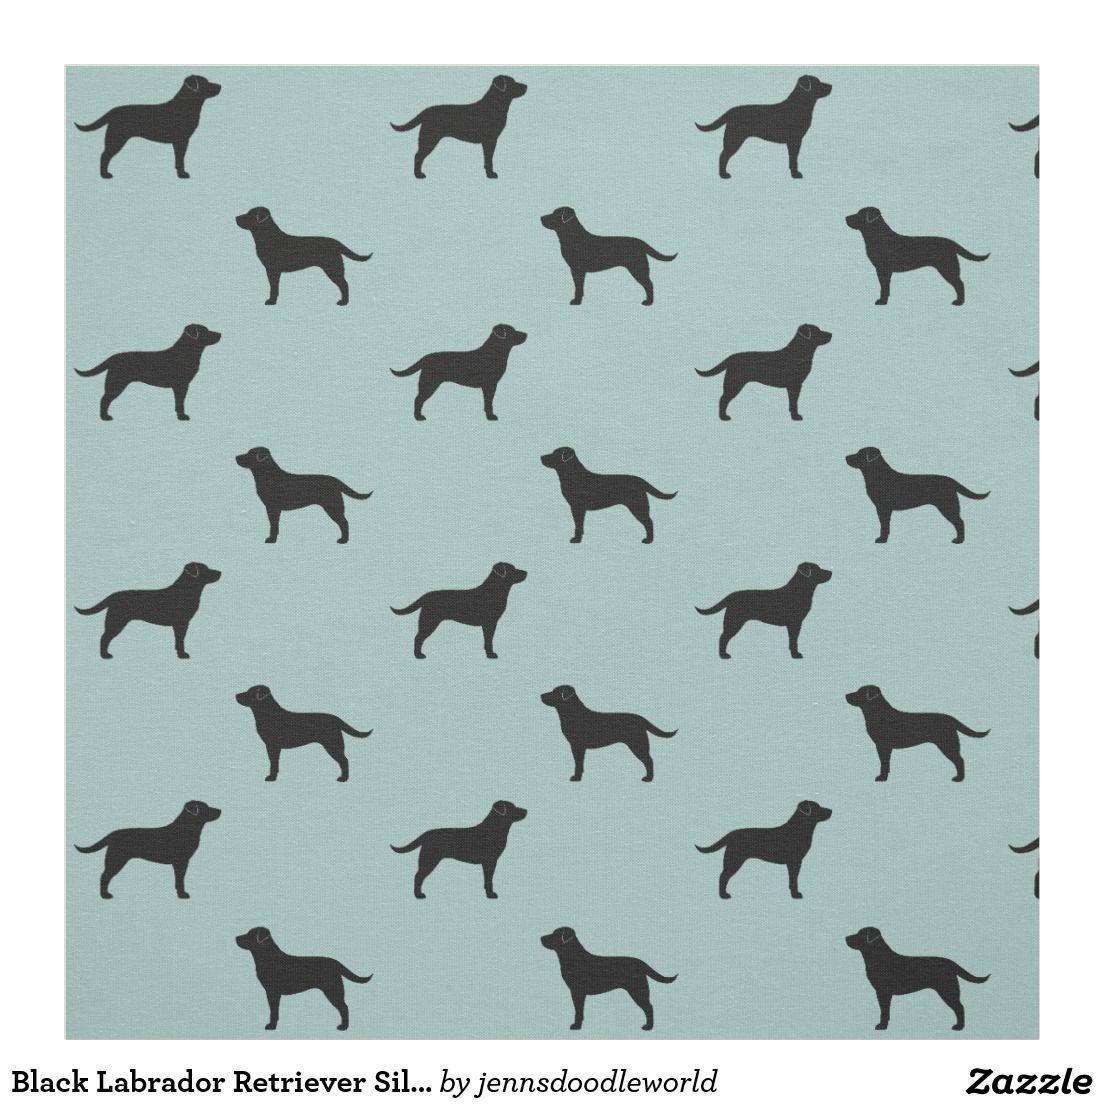 Black labrador retrievers dog silhouettes pattern fabric